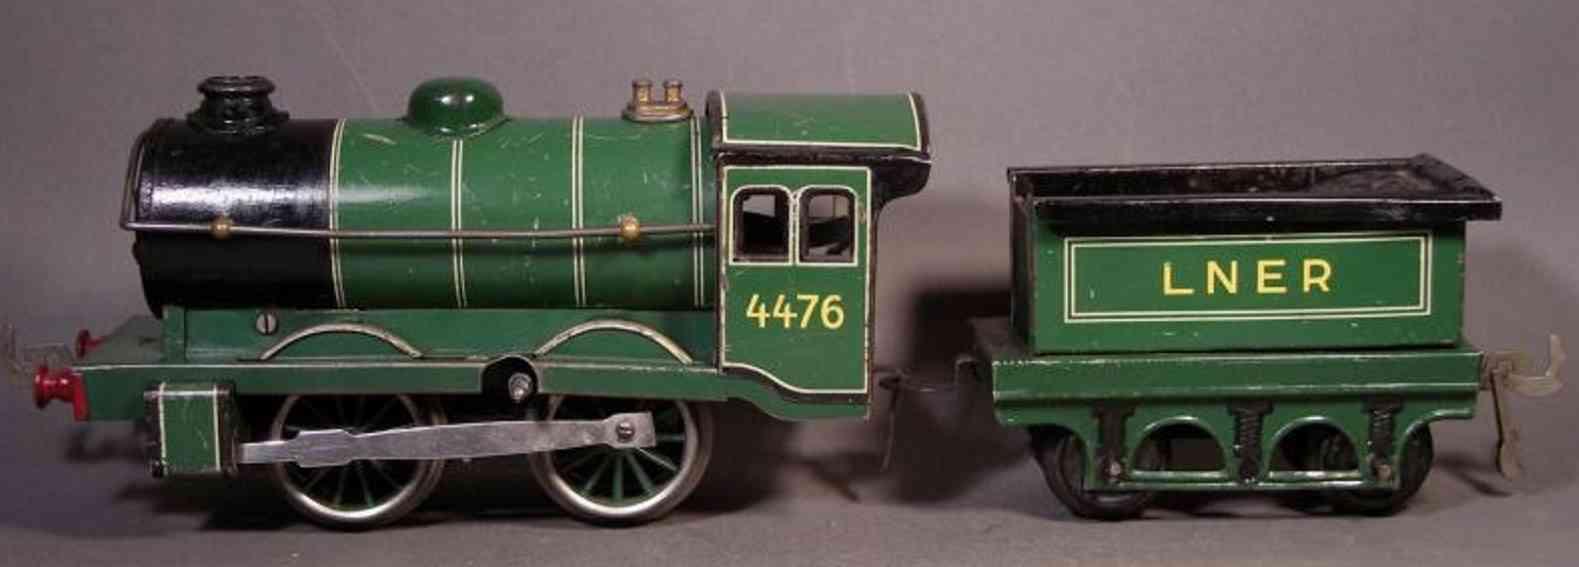 bub 940 lt railway toy engine english clockwork steam locomotive gauge 0